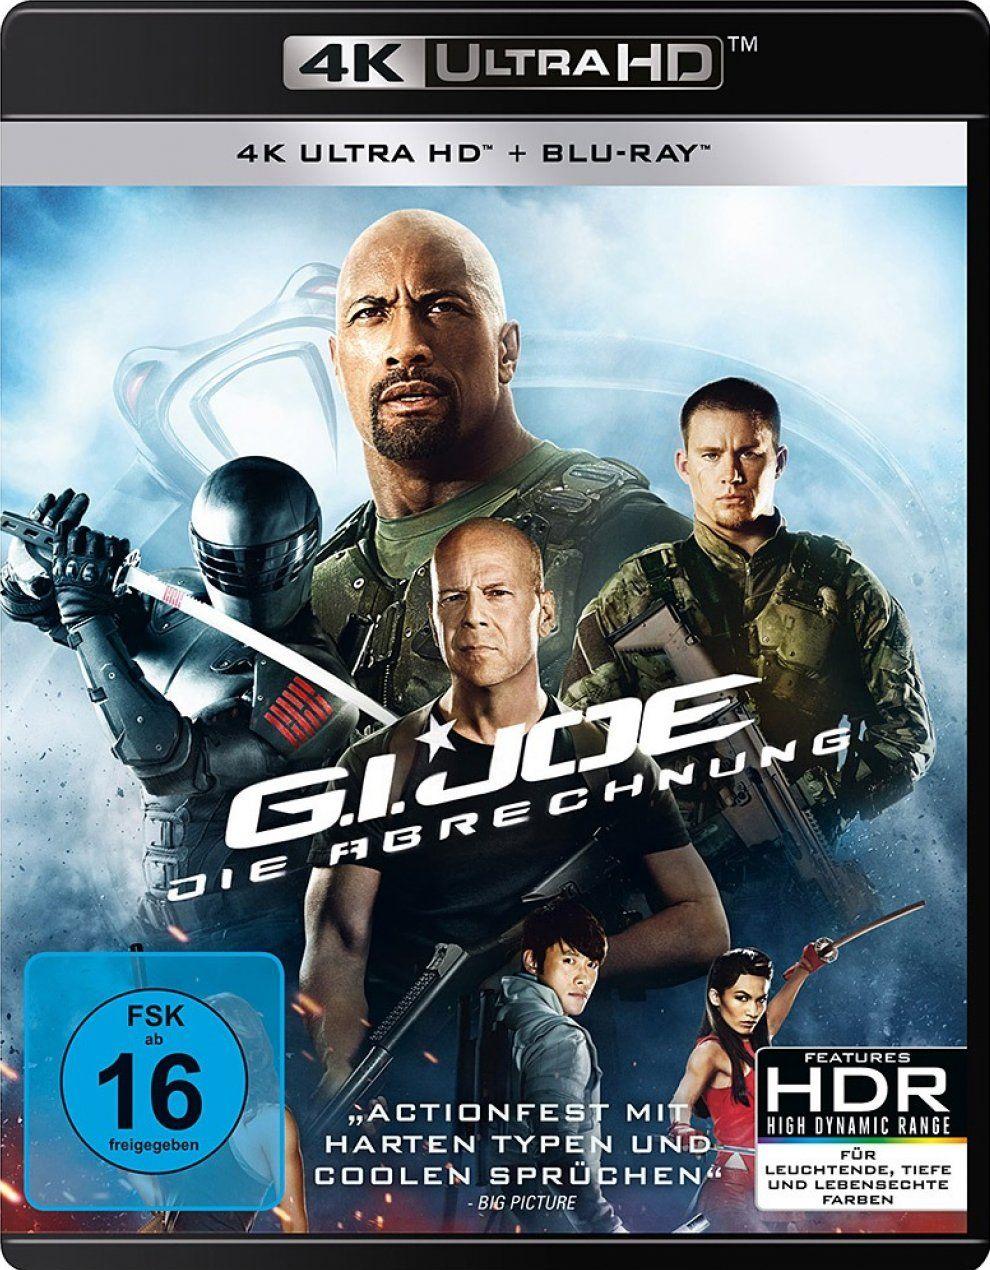 G.I. Joe - Die Abrechnung (Extended Cut) (2 Discs) (UHD BLURAY + BLURAY)